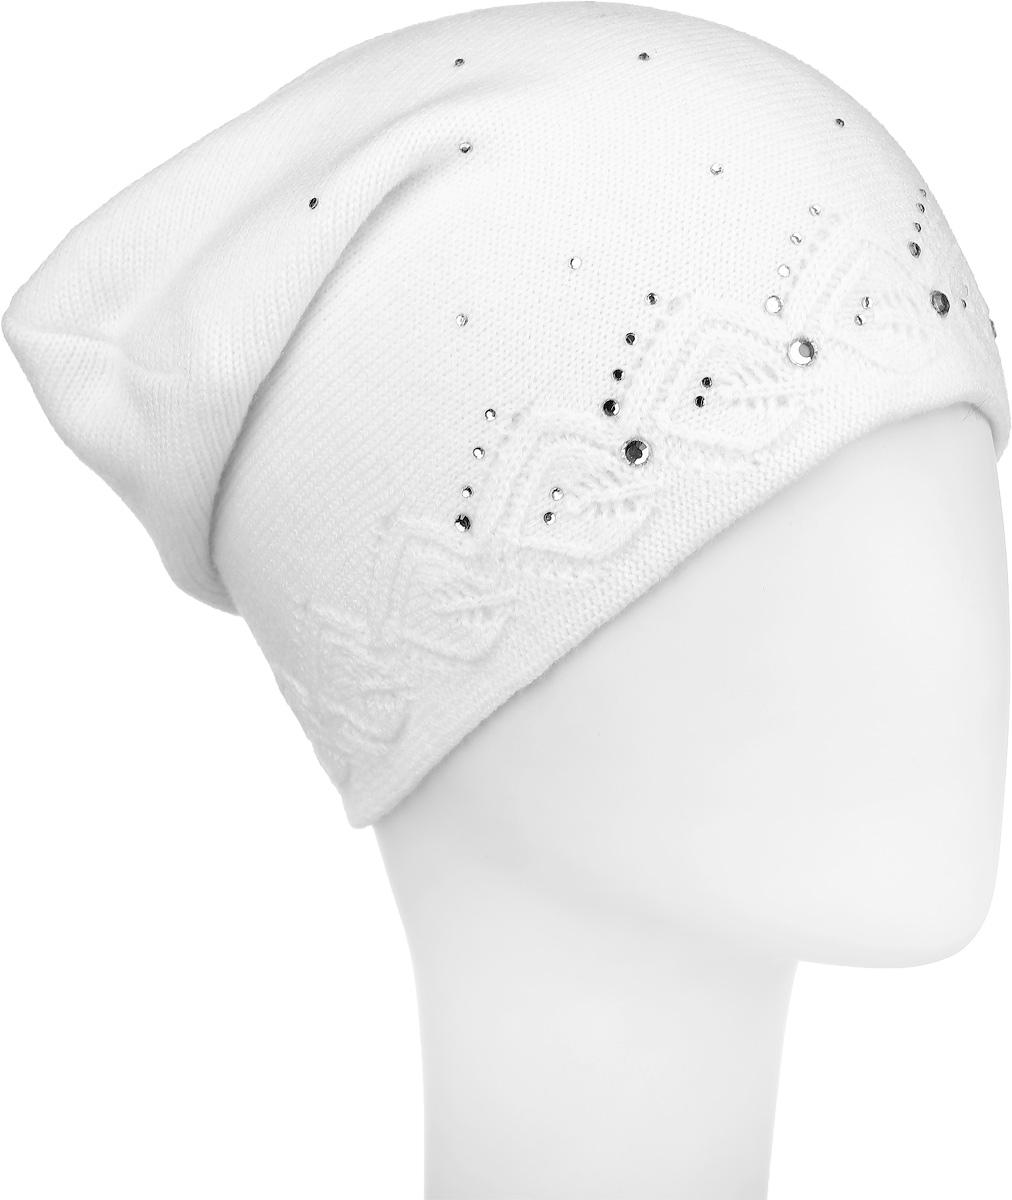 Шапка женская Finn Flare, цвет: белый. W16-11126_201. Размер 56 шапка женская finn flare цвет черный w16 11134 200 размер 56